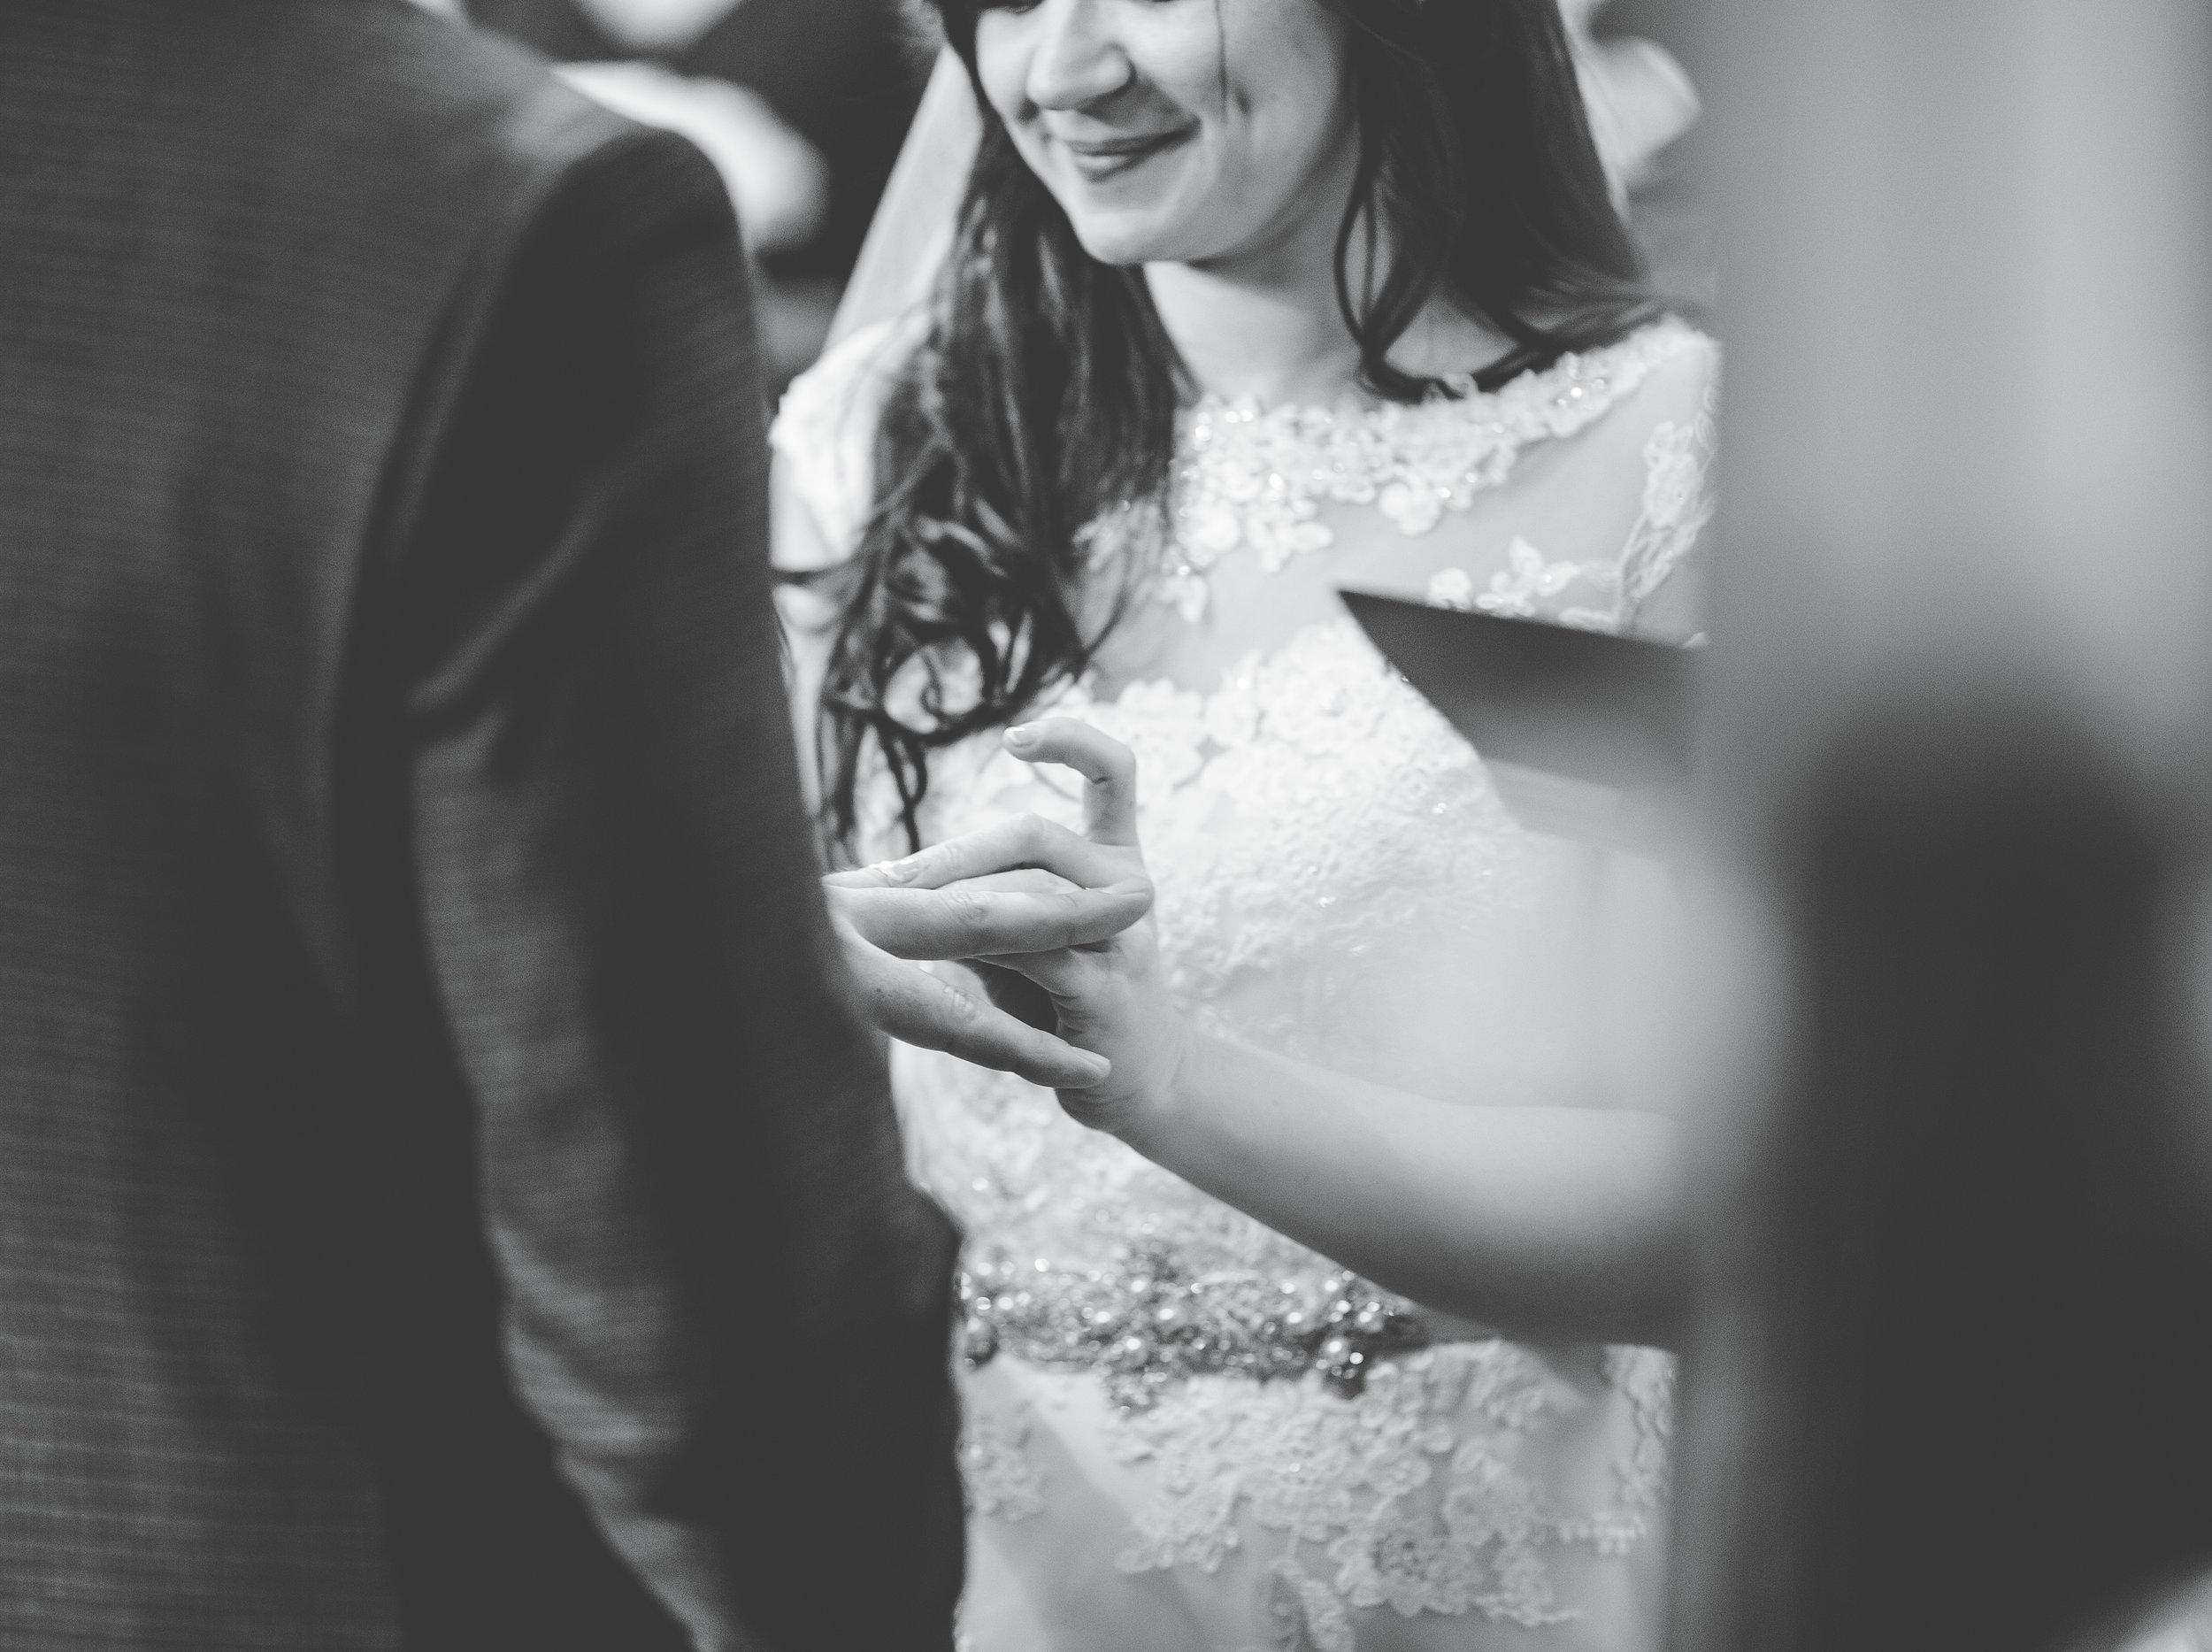 exchange rings - wedding photographer Lancashire